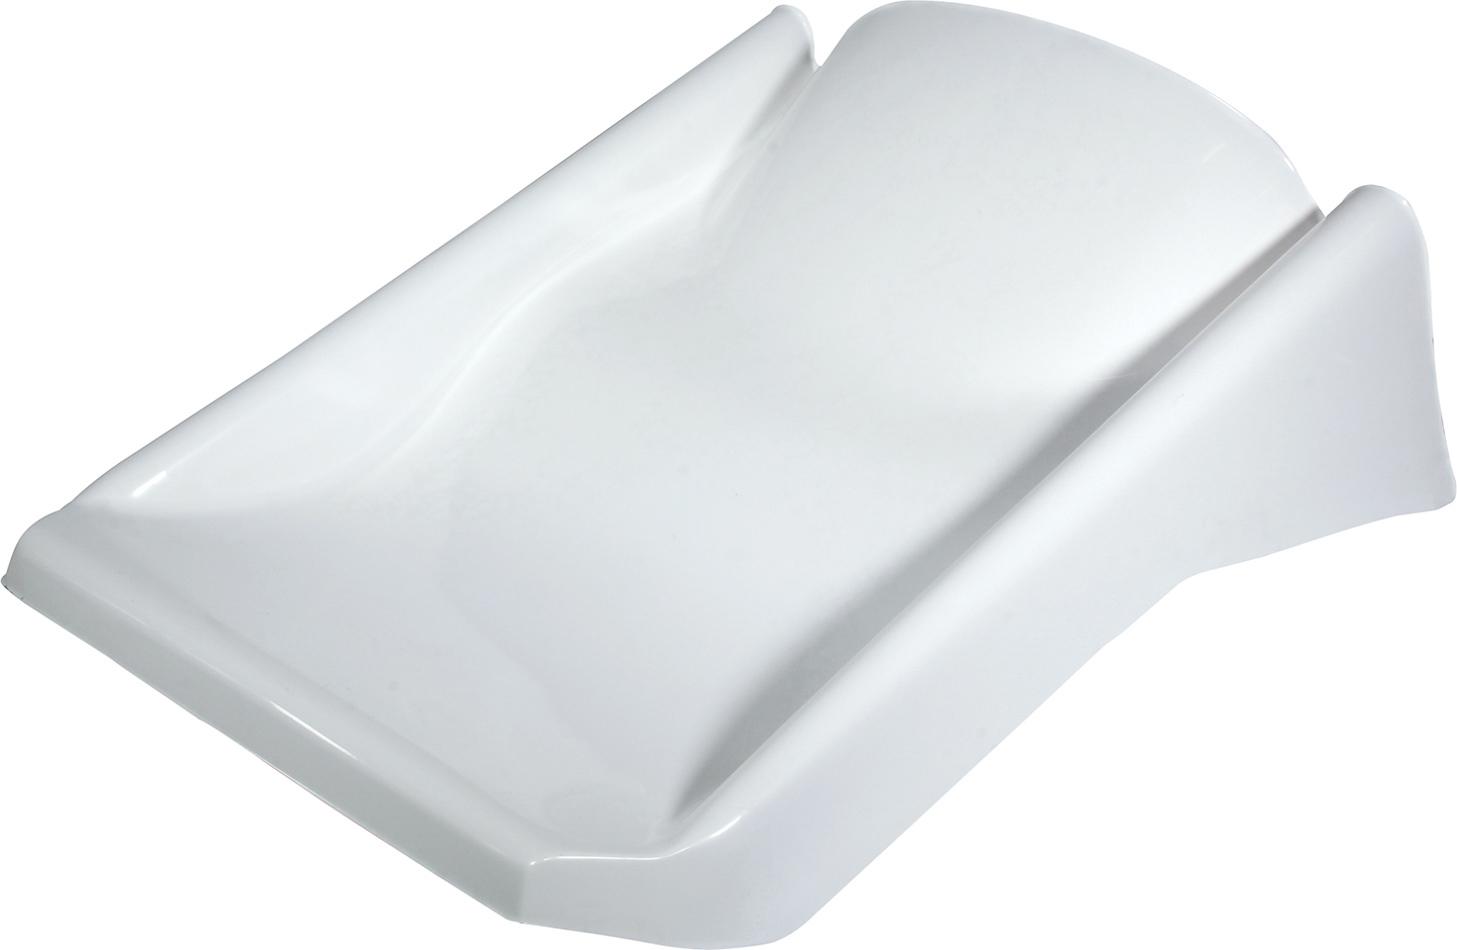 Ti22 Performance Nose Max Air White